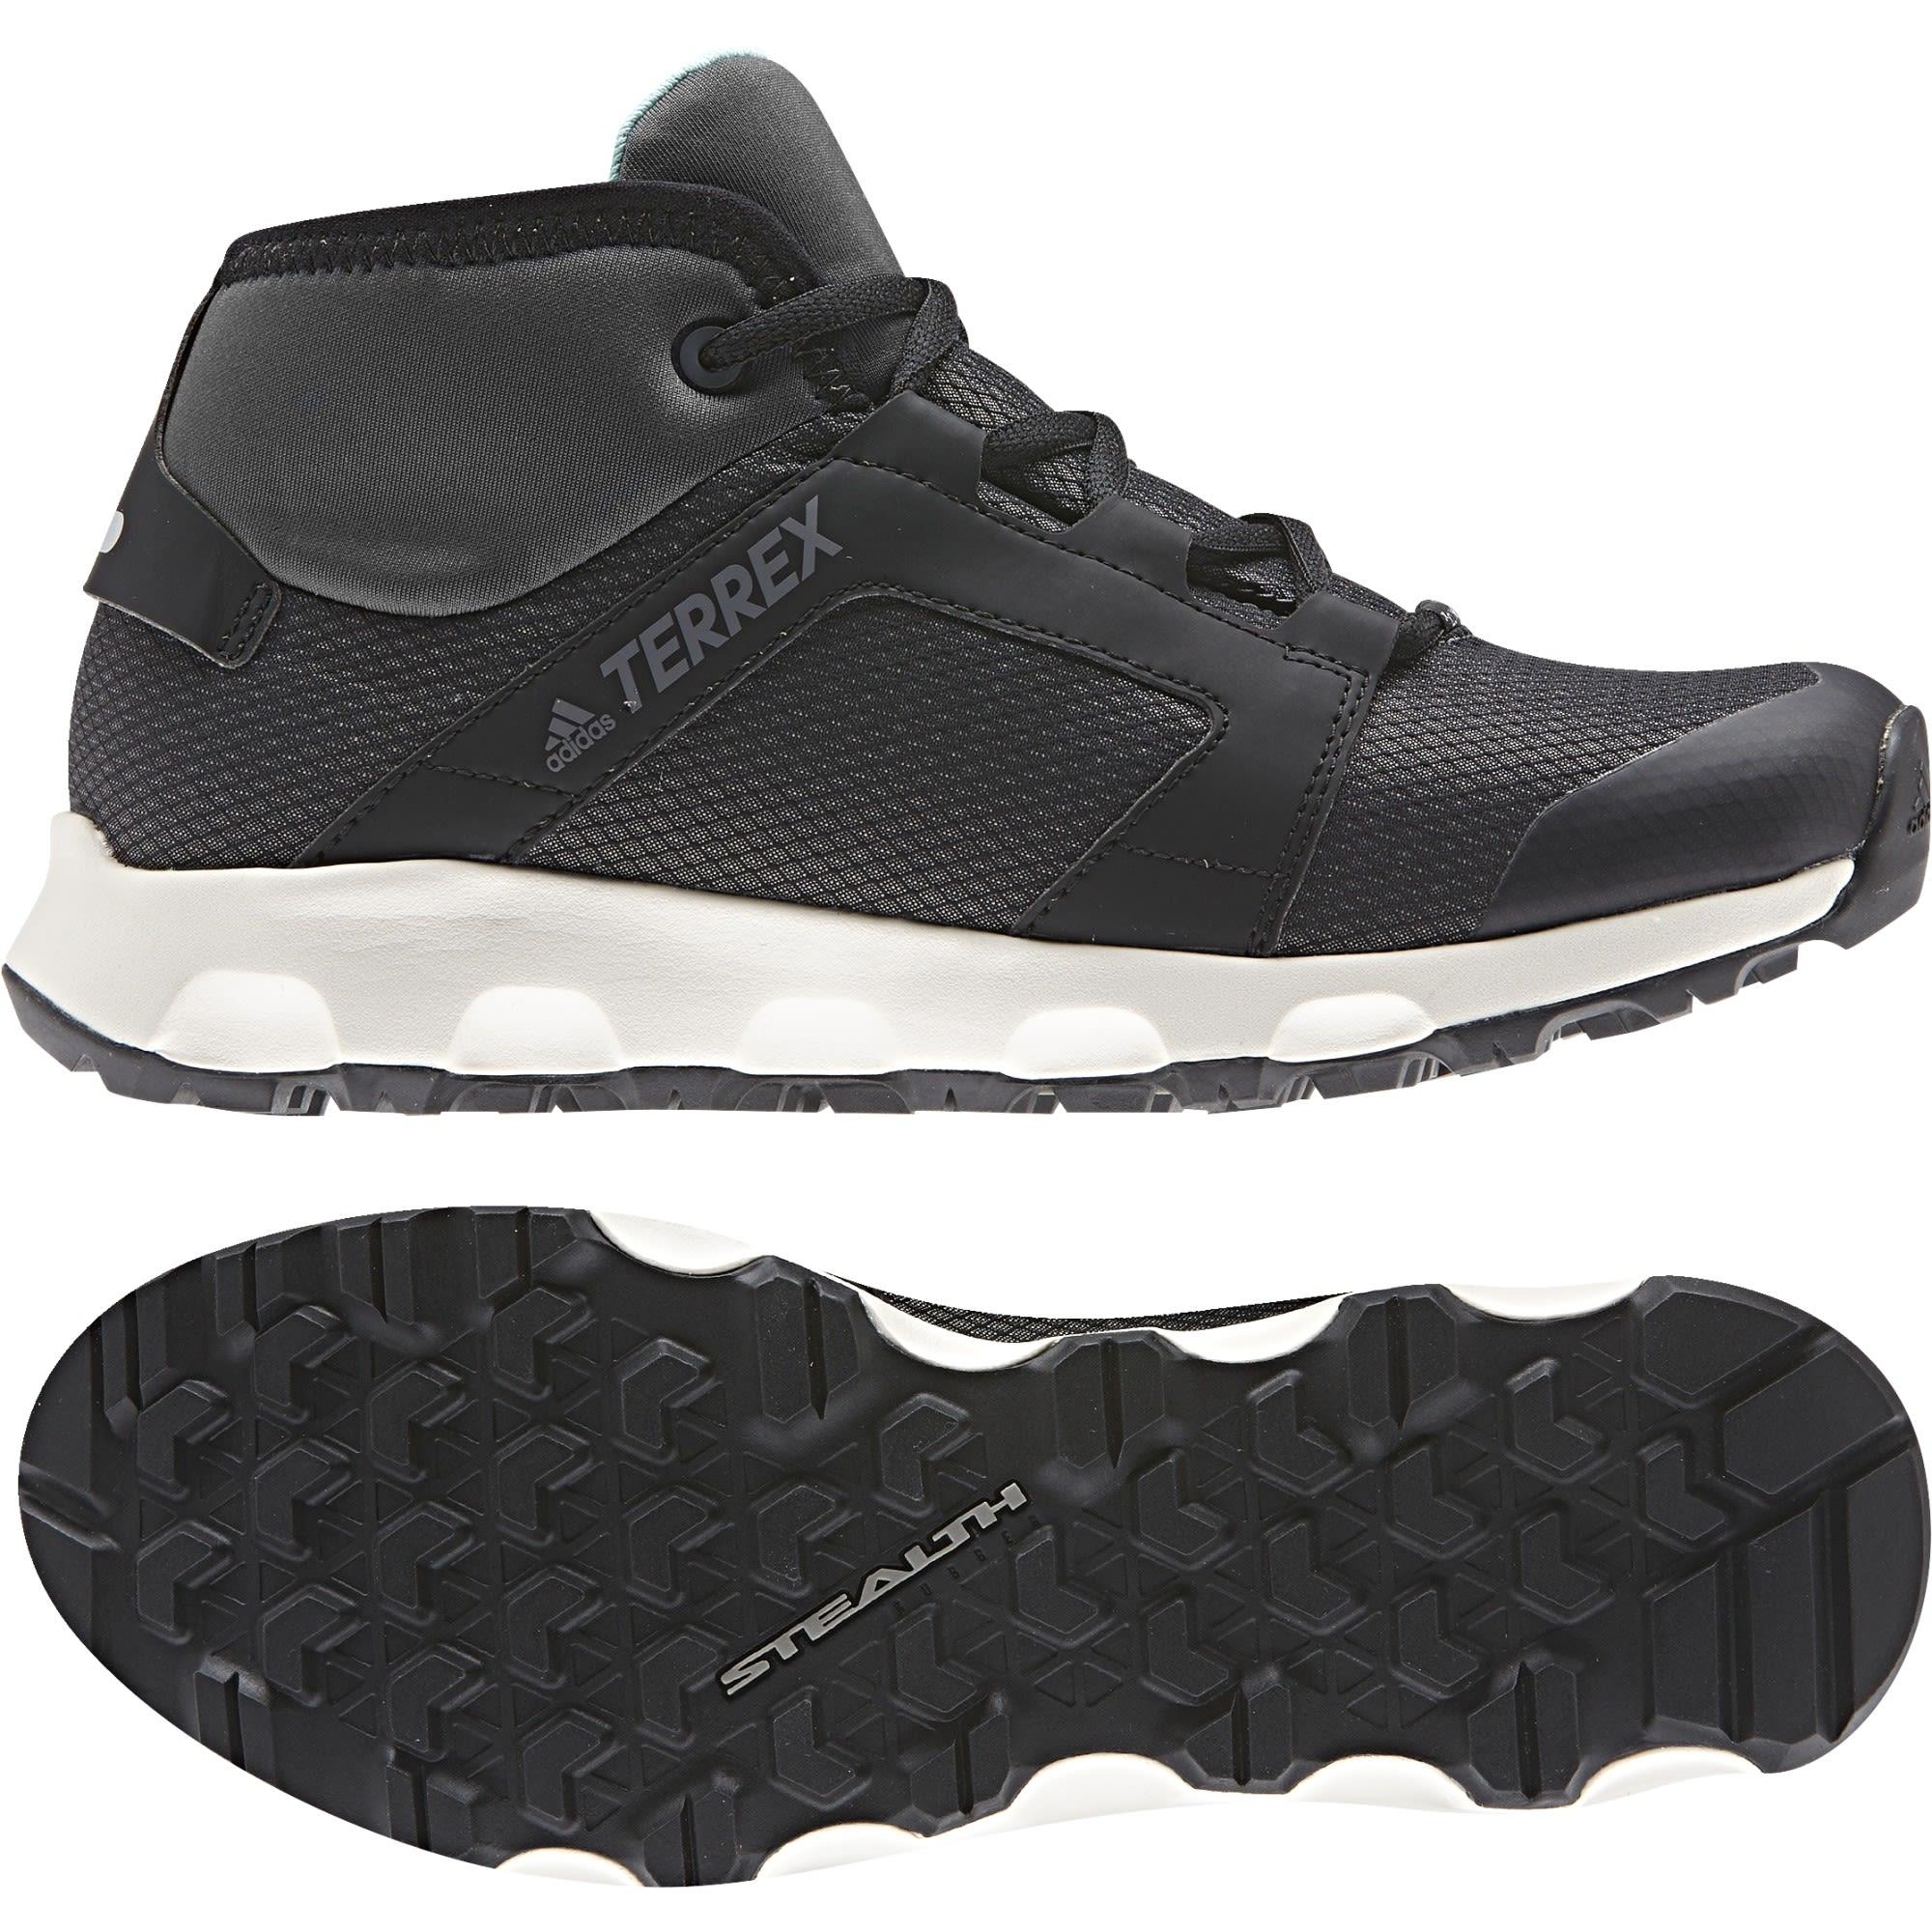 adidas W Terrex Voyager Climawarm Climaproof | Größe EU 37 1/3 / UK 4.5 / US 6